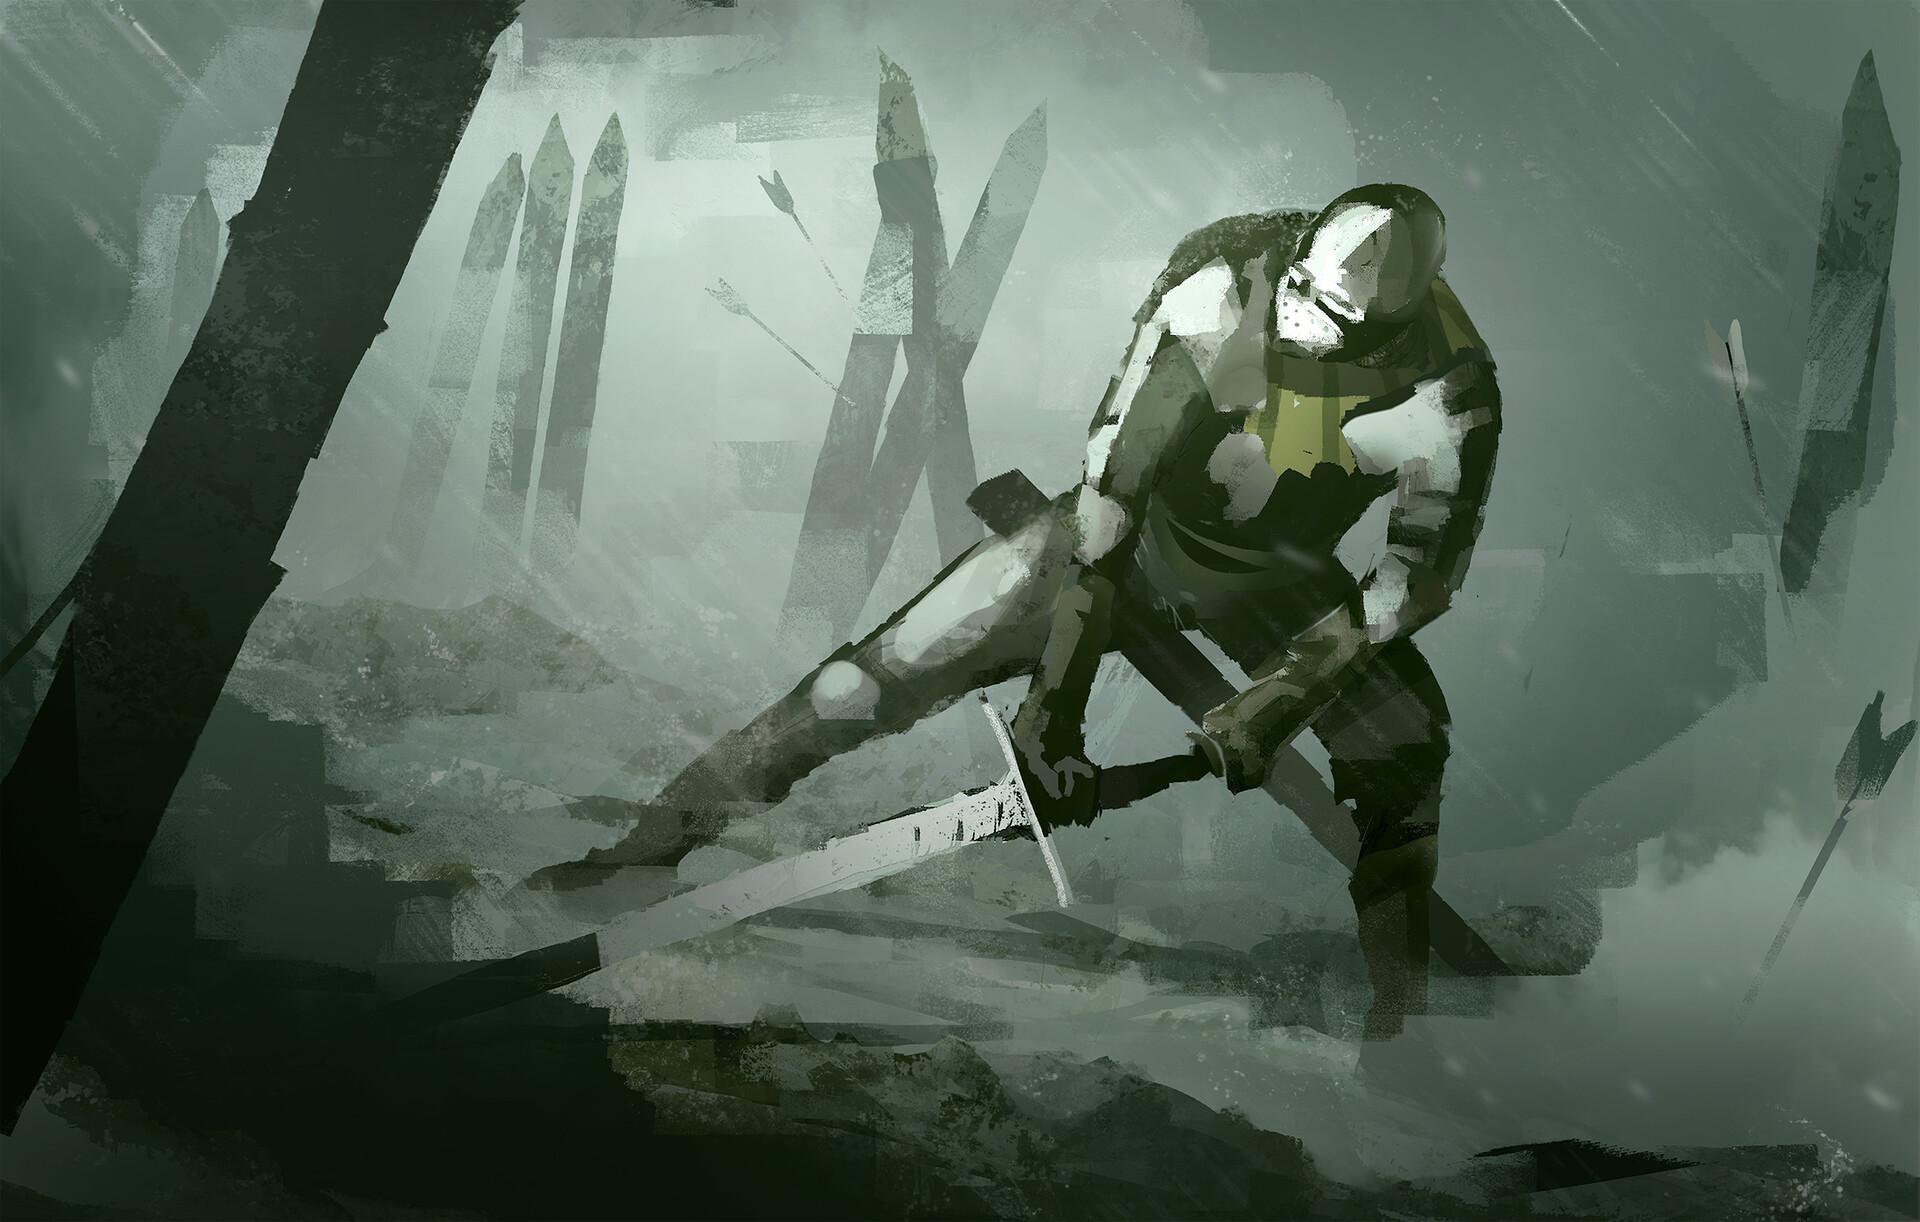 Jaromir hrivnac knight 04